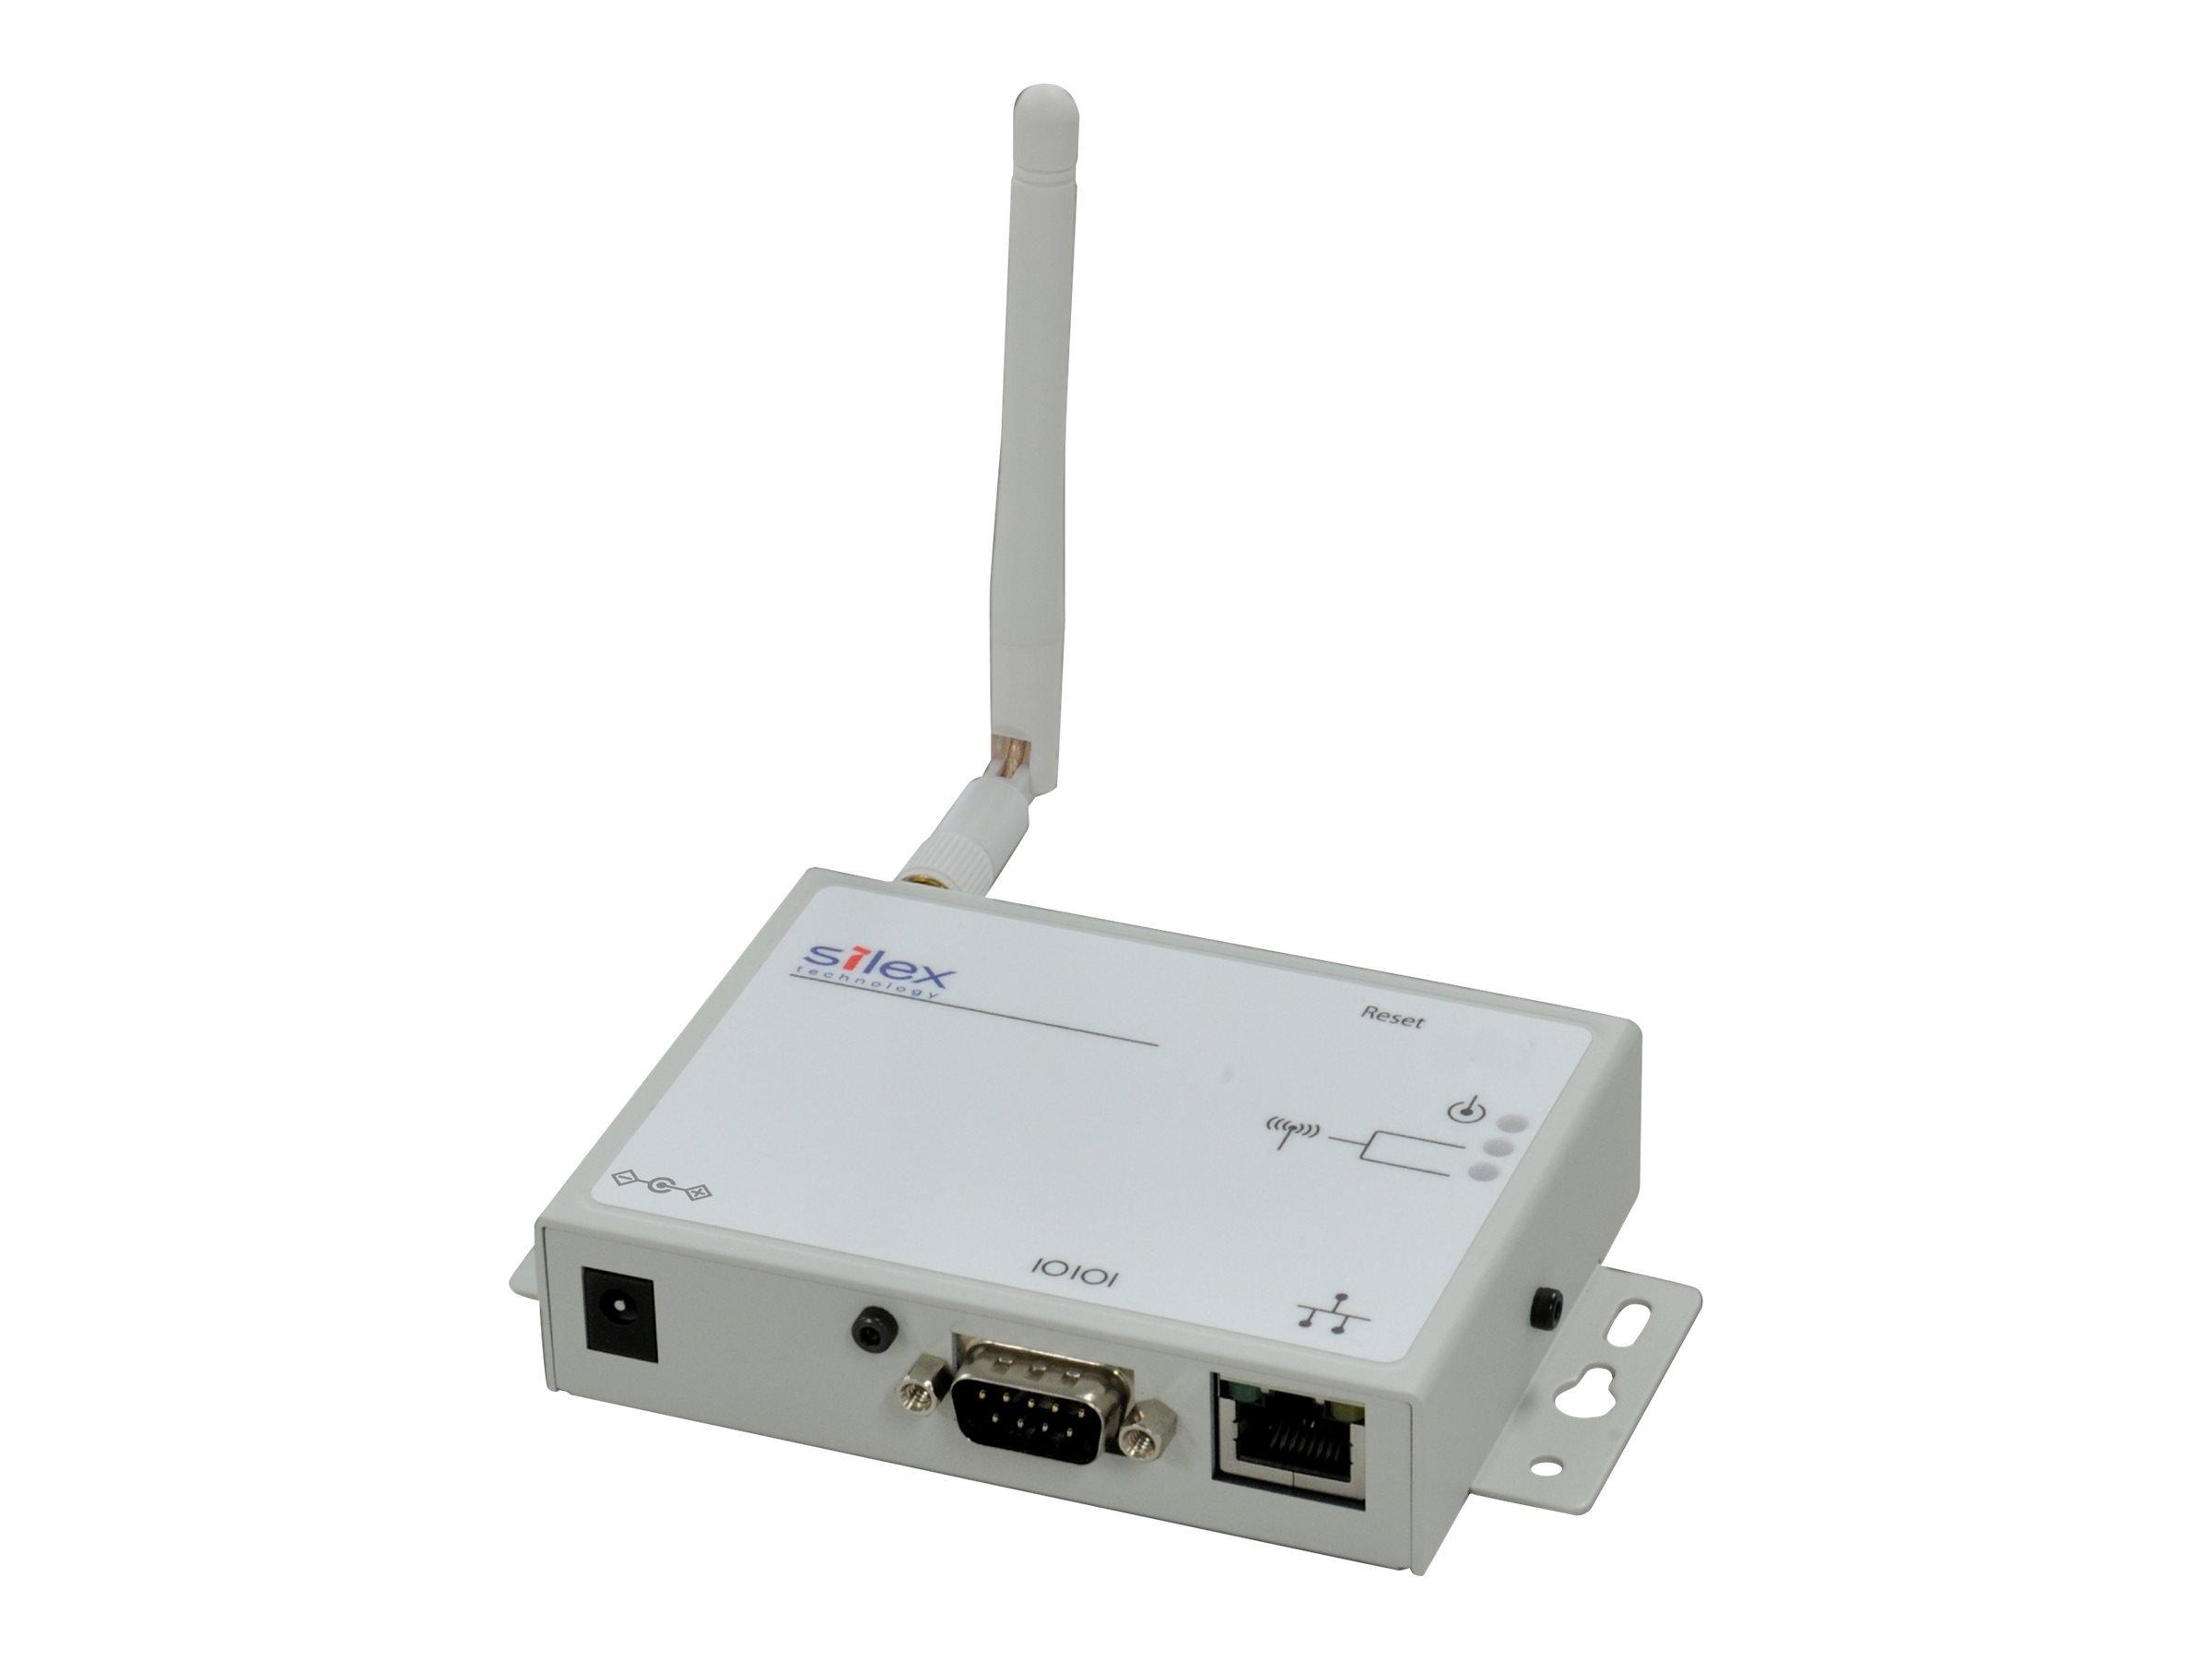 Silex SD-320An - Wireless Device Server - Gray, White by SILEX